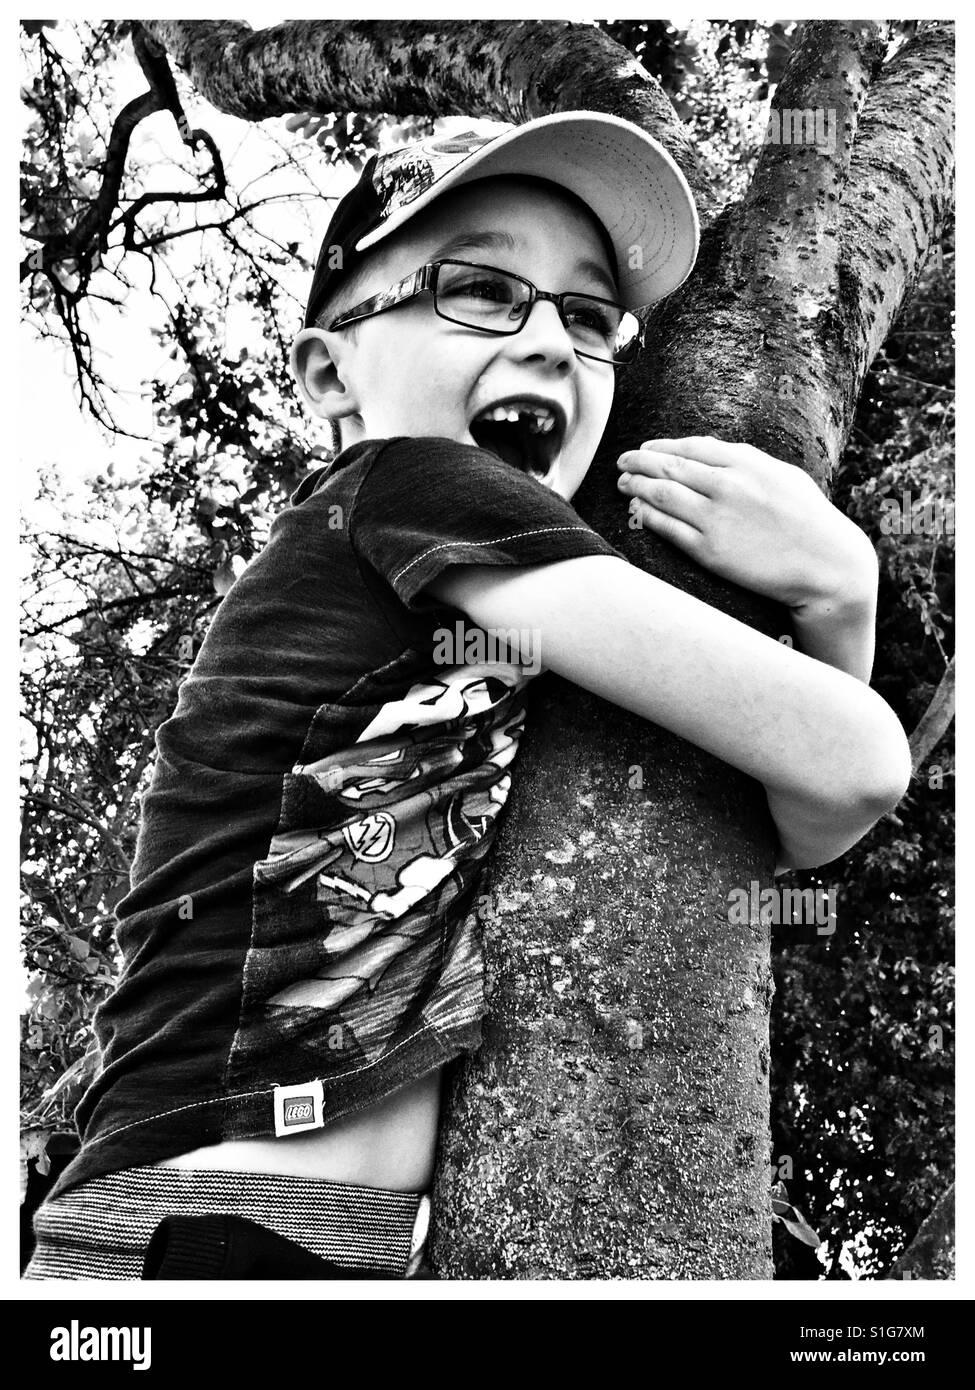 Boy stuck up a tree. - Stock Image